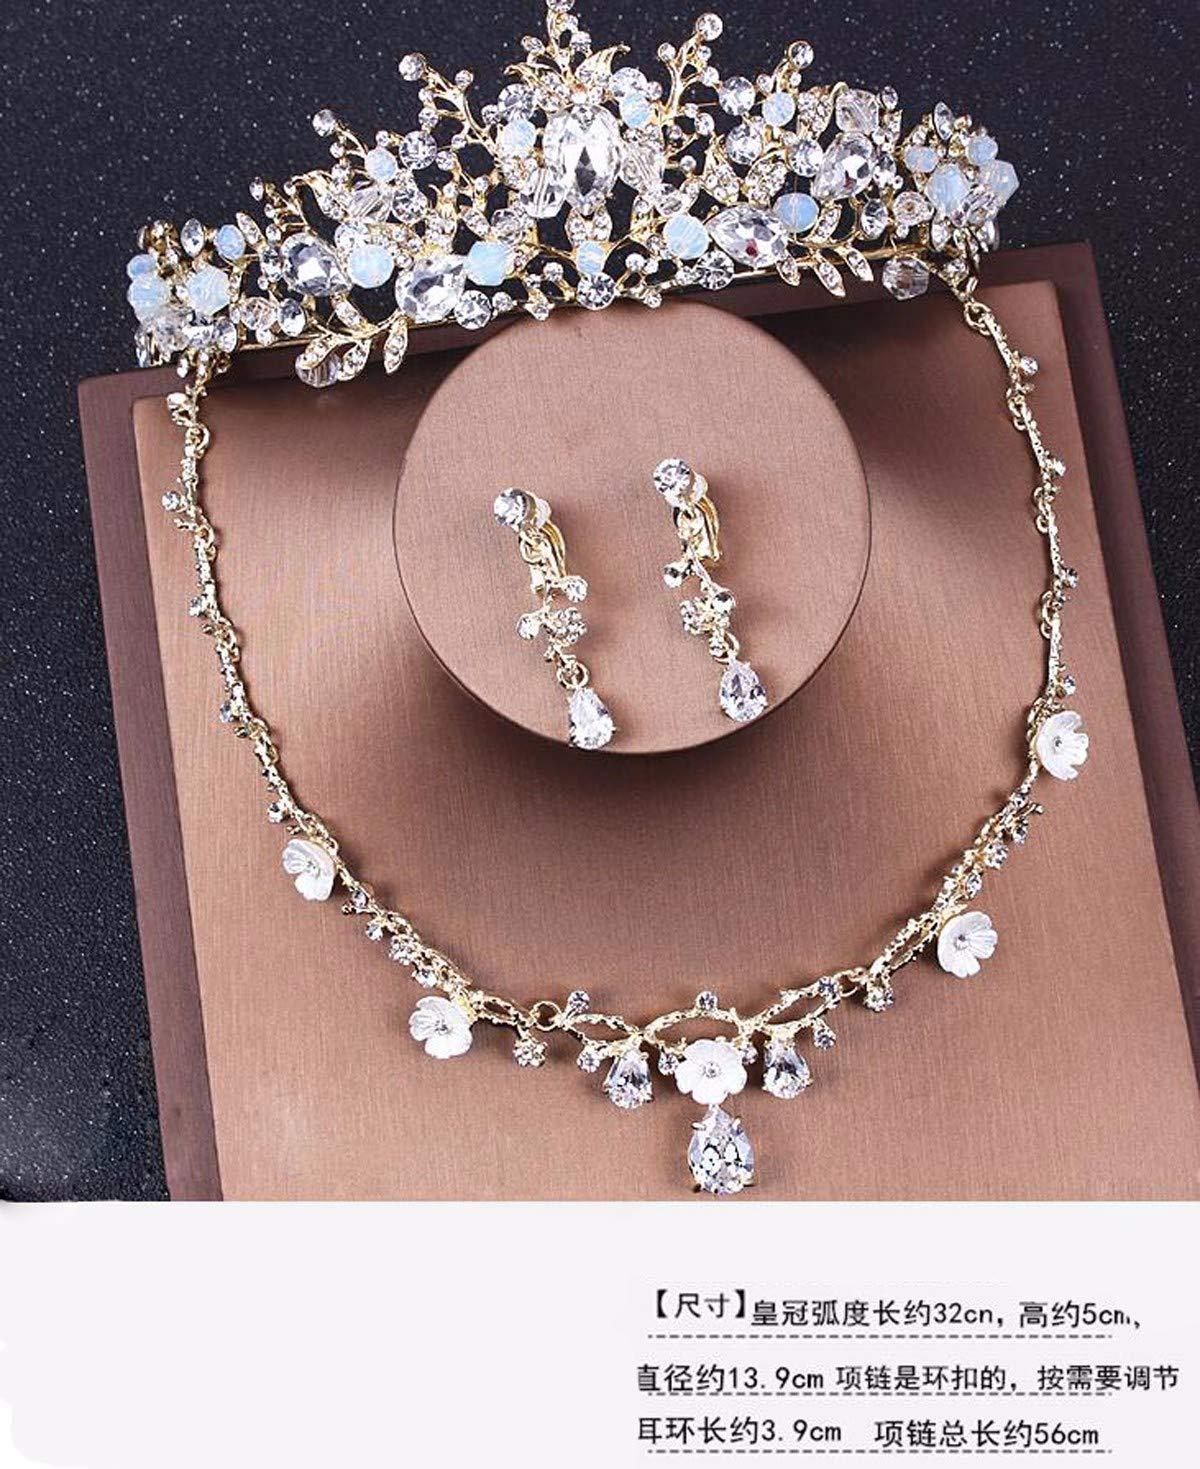 Girls Crown, Beautiful headdress/Crown Dress Bridal Wedding Accessories Necklace Baroque Crown Wedding Accessories by Zehaer (Image #3)